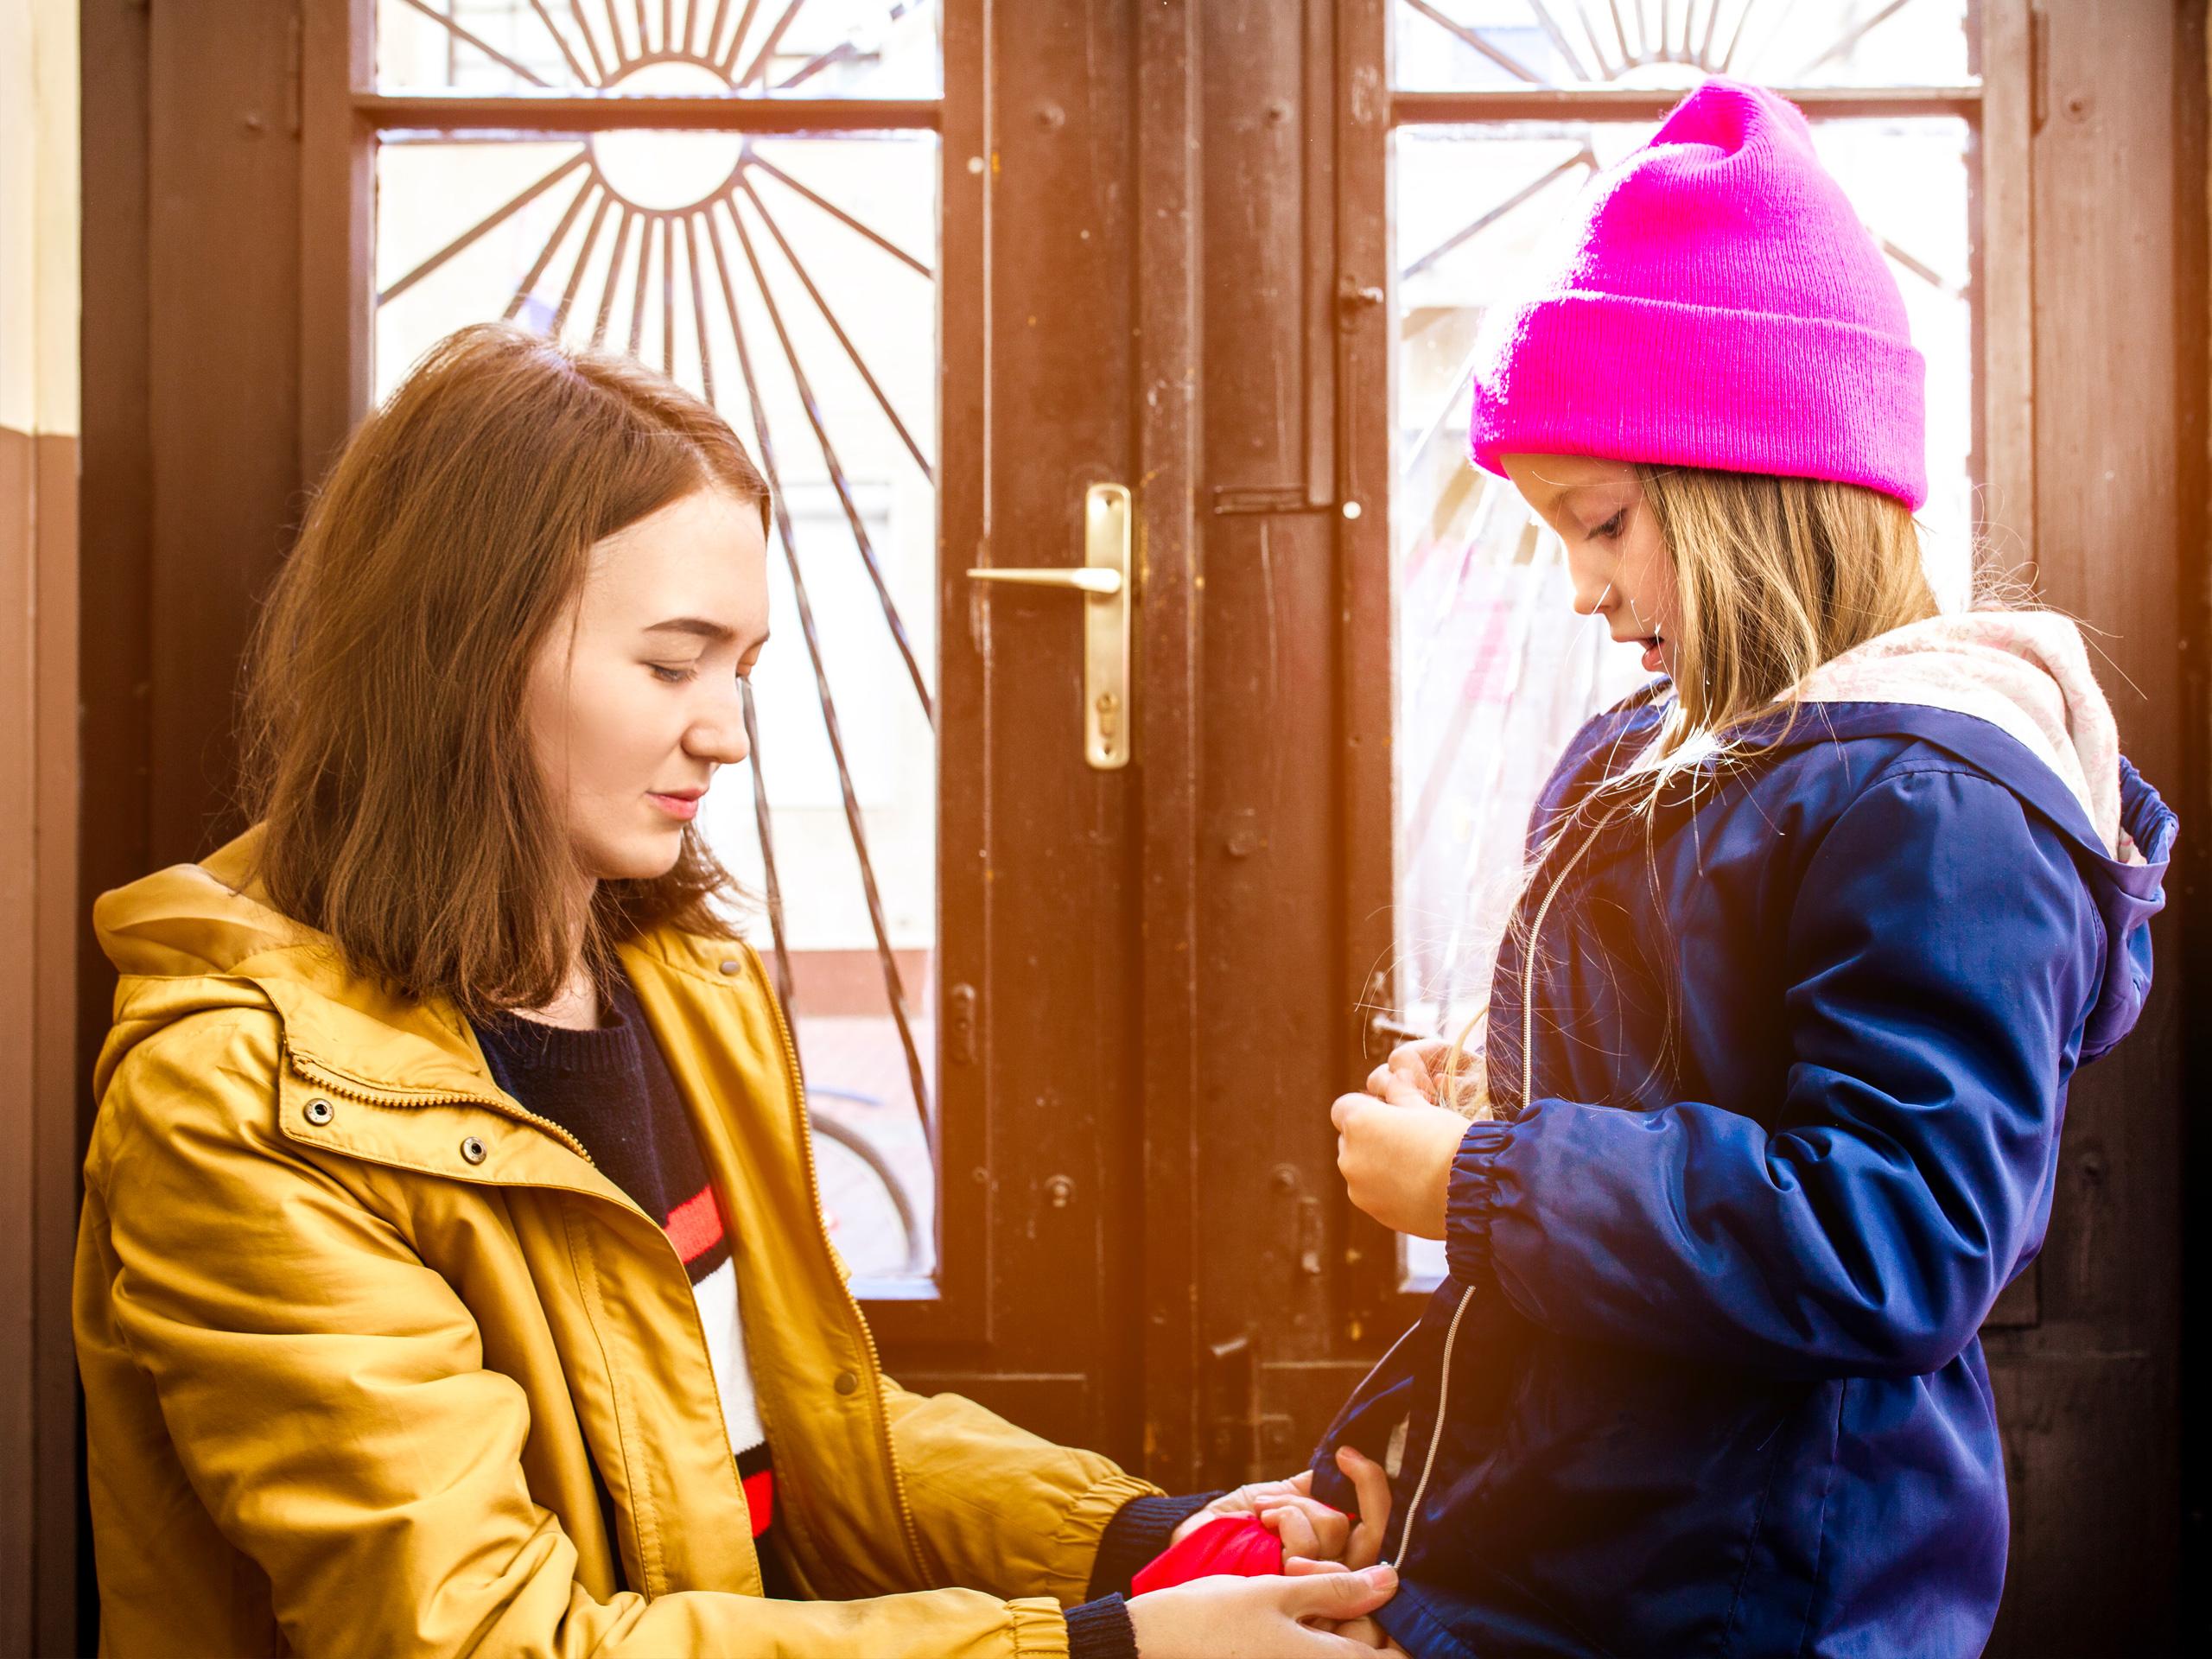 young mother helps her daughter to fasten her jacket next to the front door